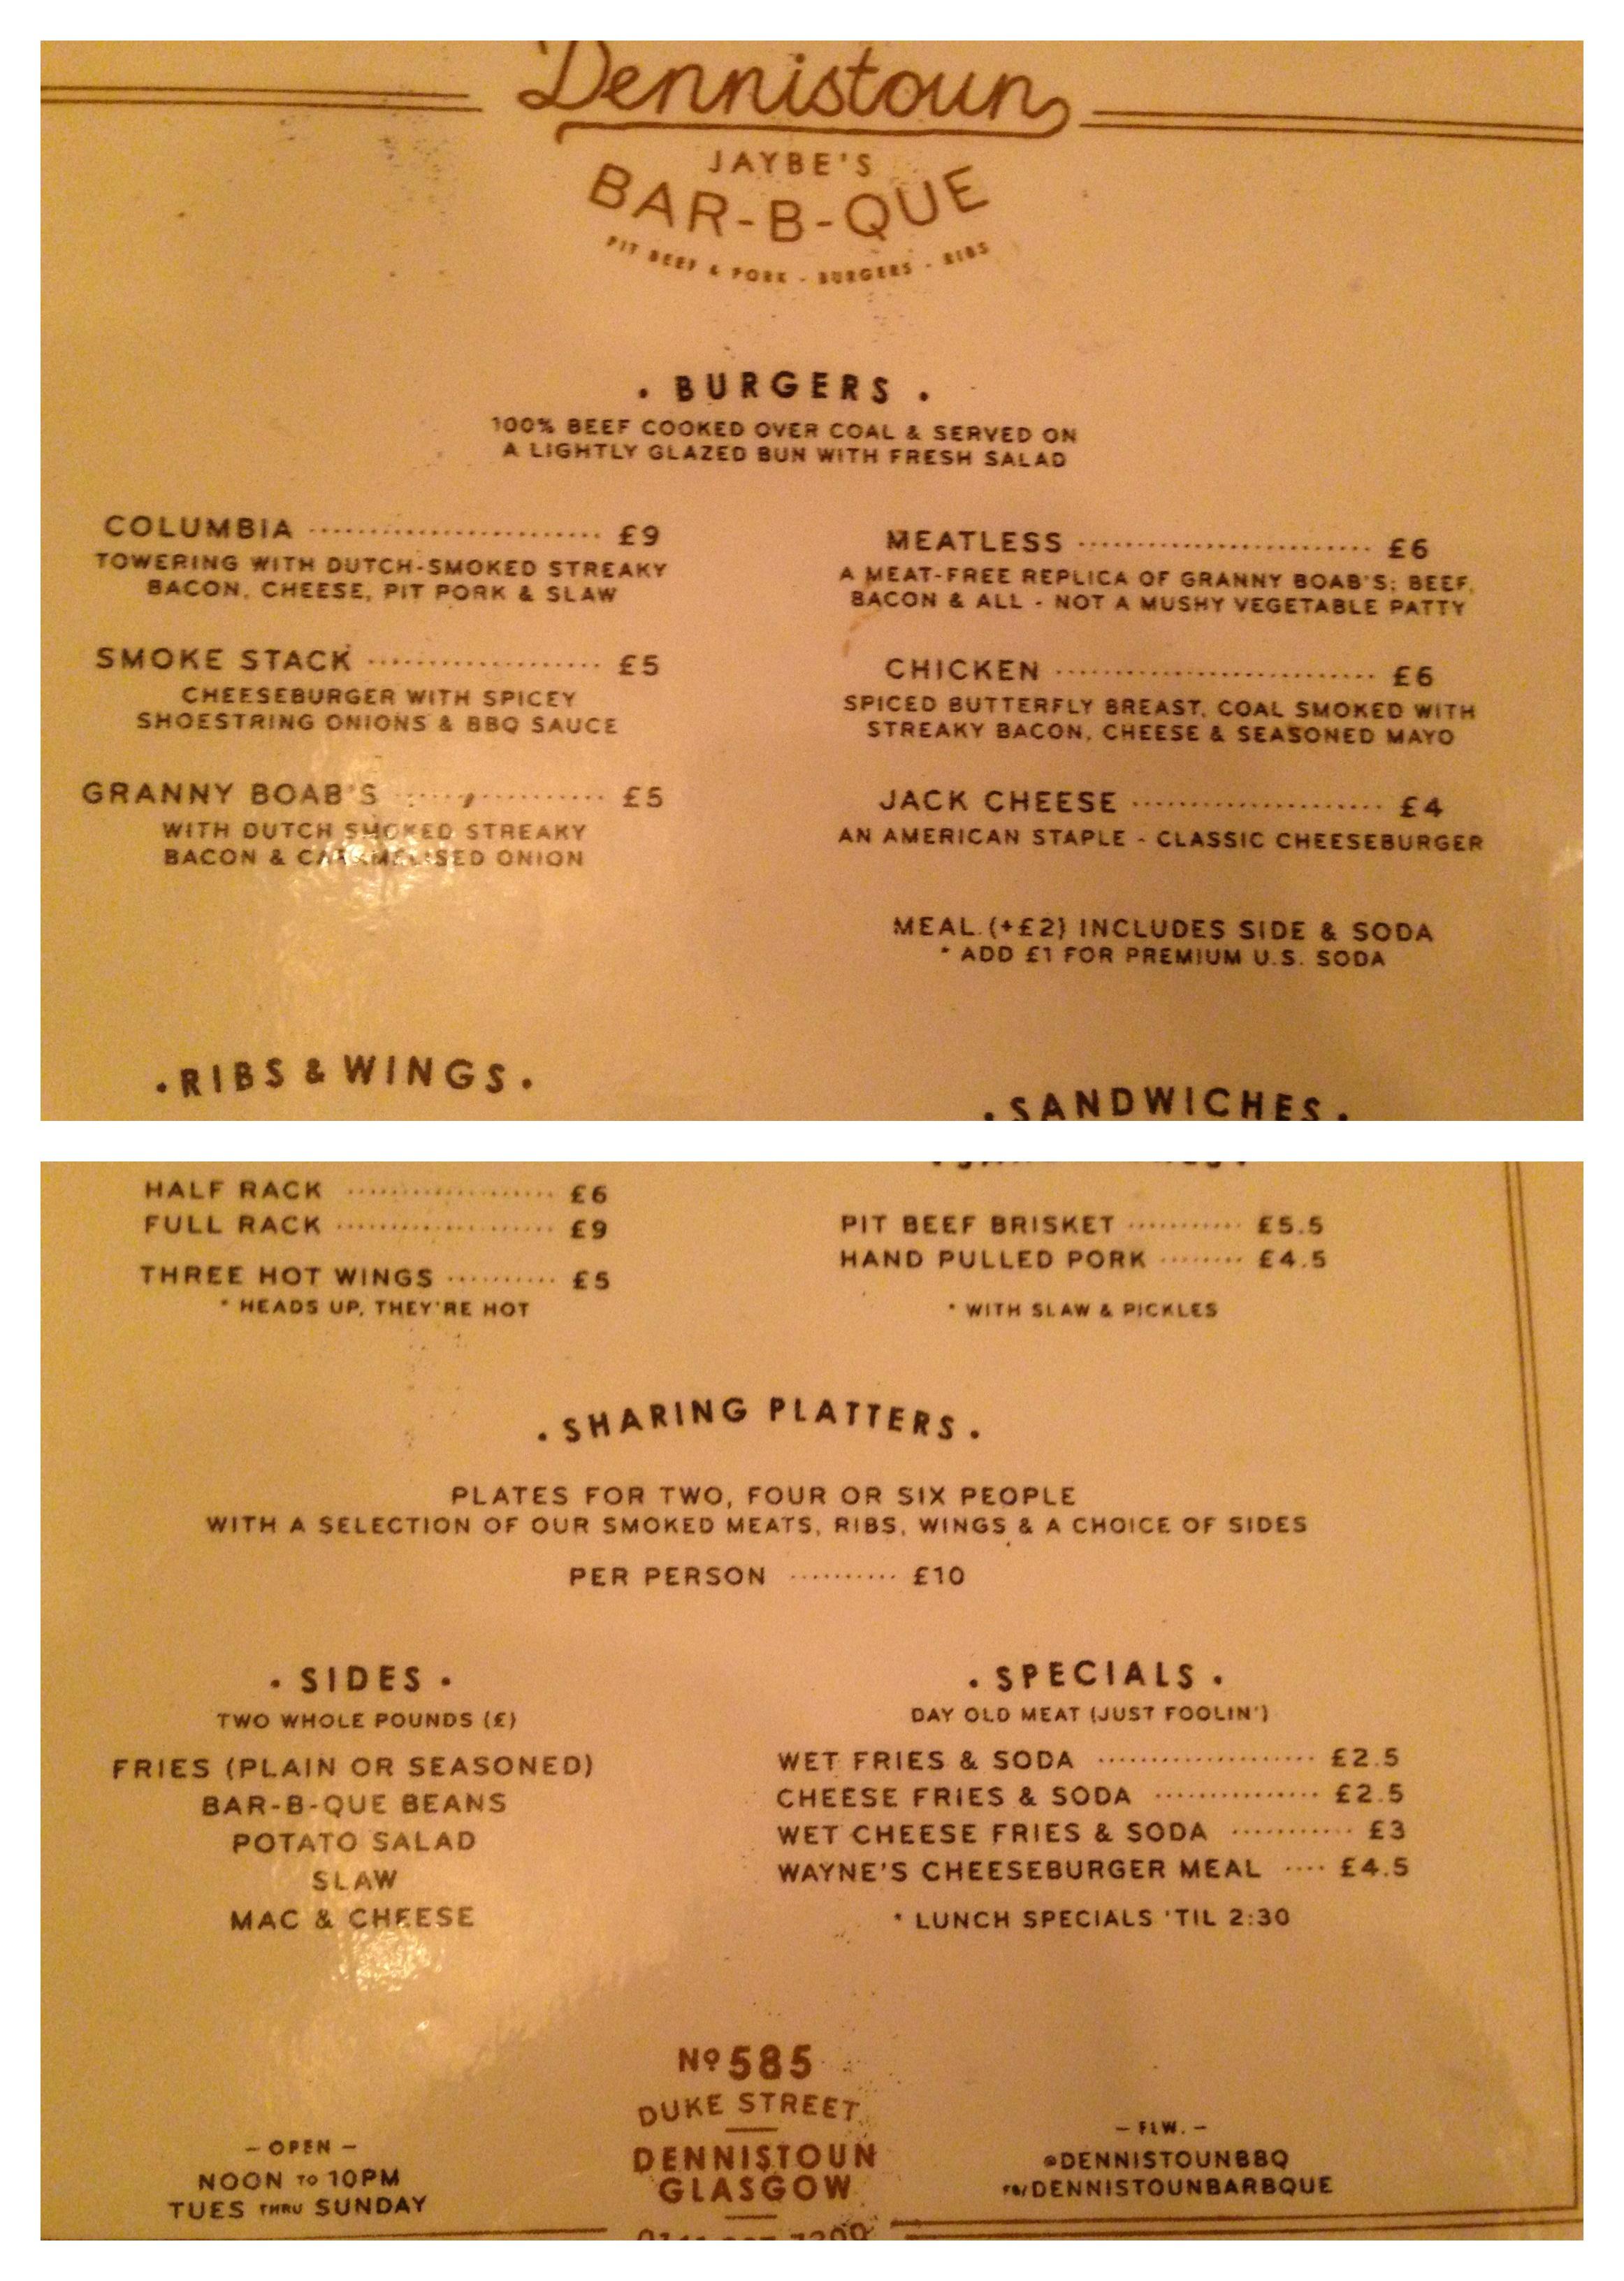 kitchen pictures for walls barstools the columbia burger – dennistoun bar-b-que james vs.